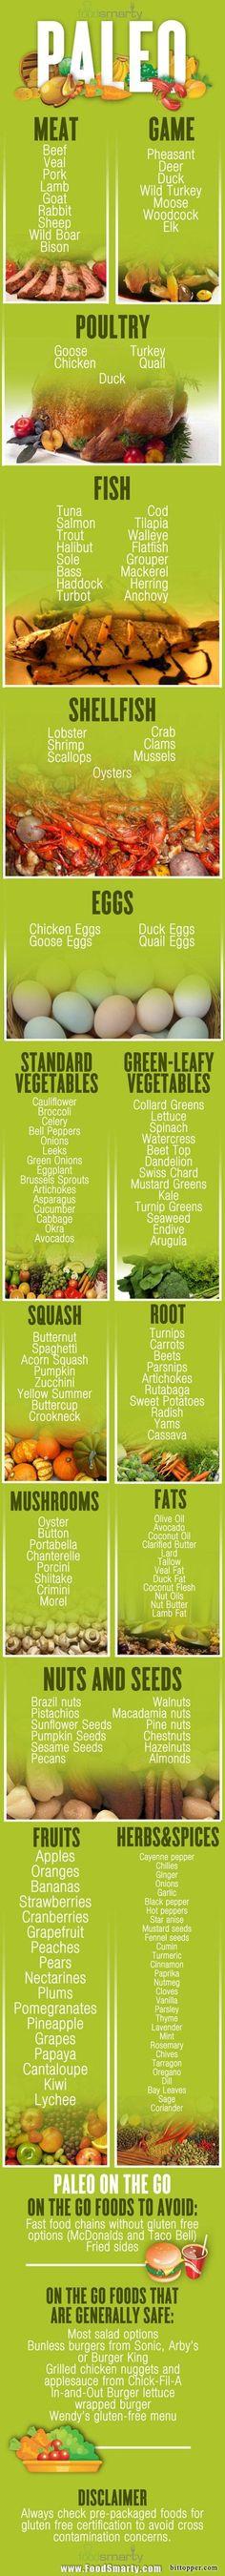 Paleo Diet Info Graphic - Quick Reference Card via bittopper.com